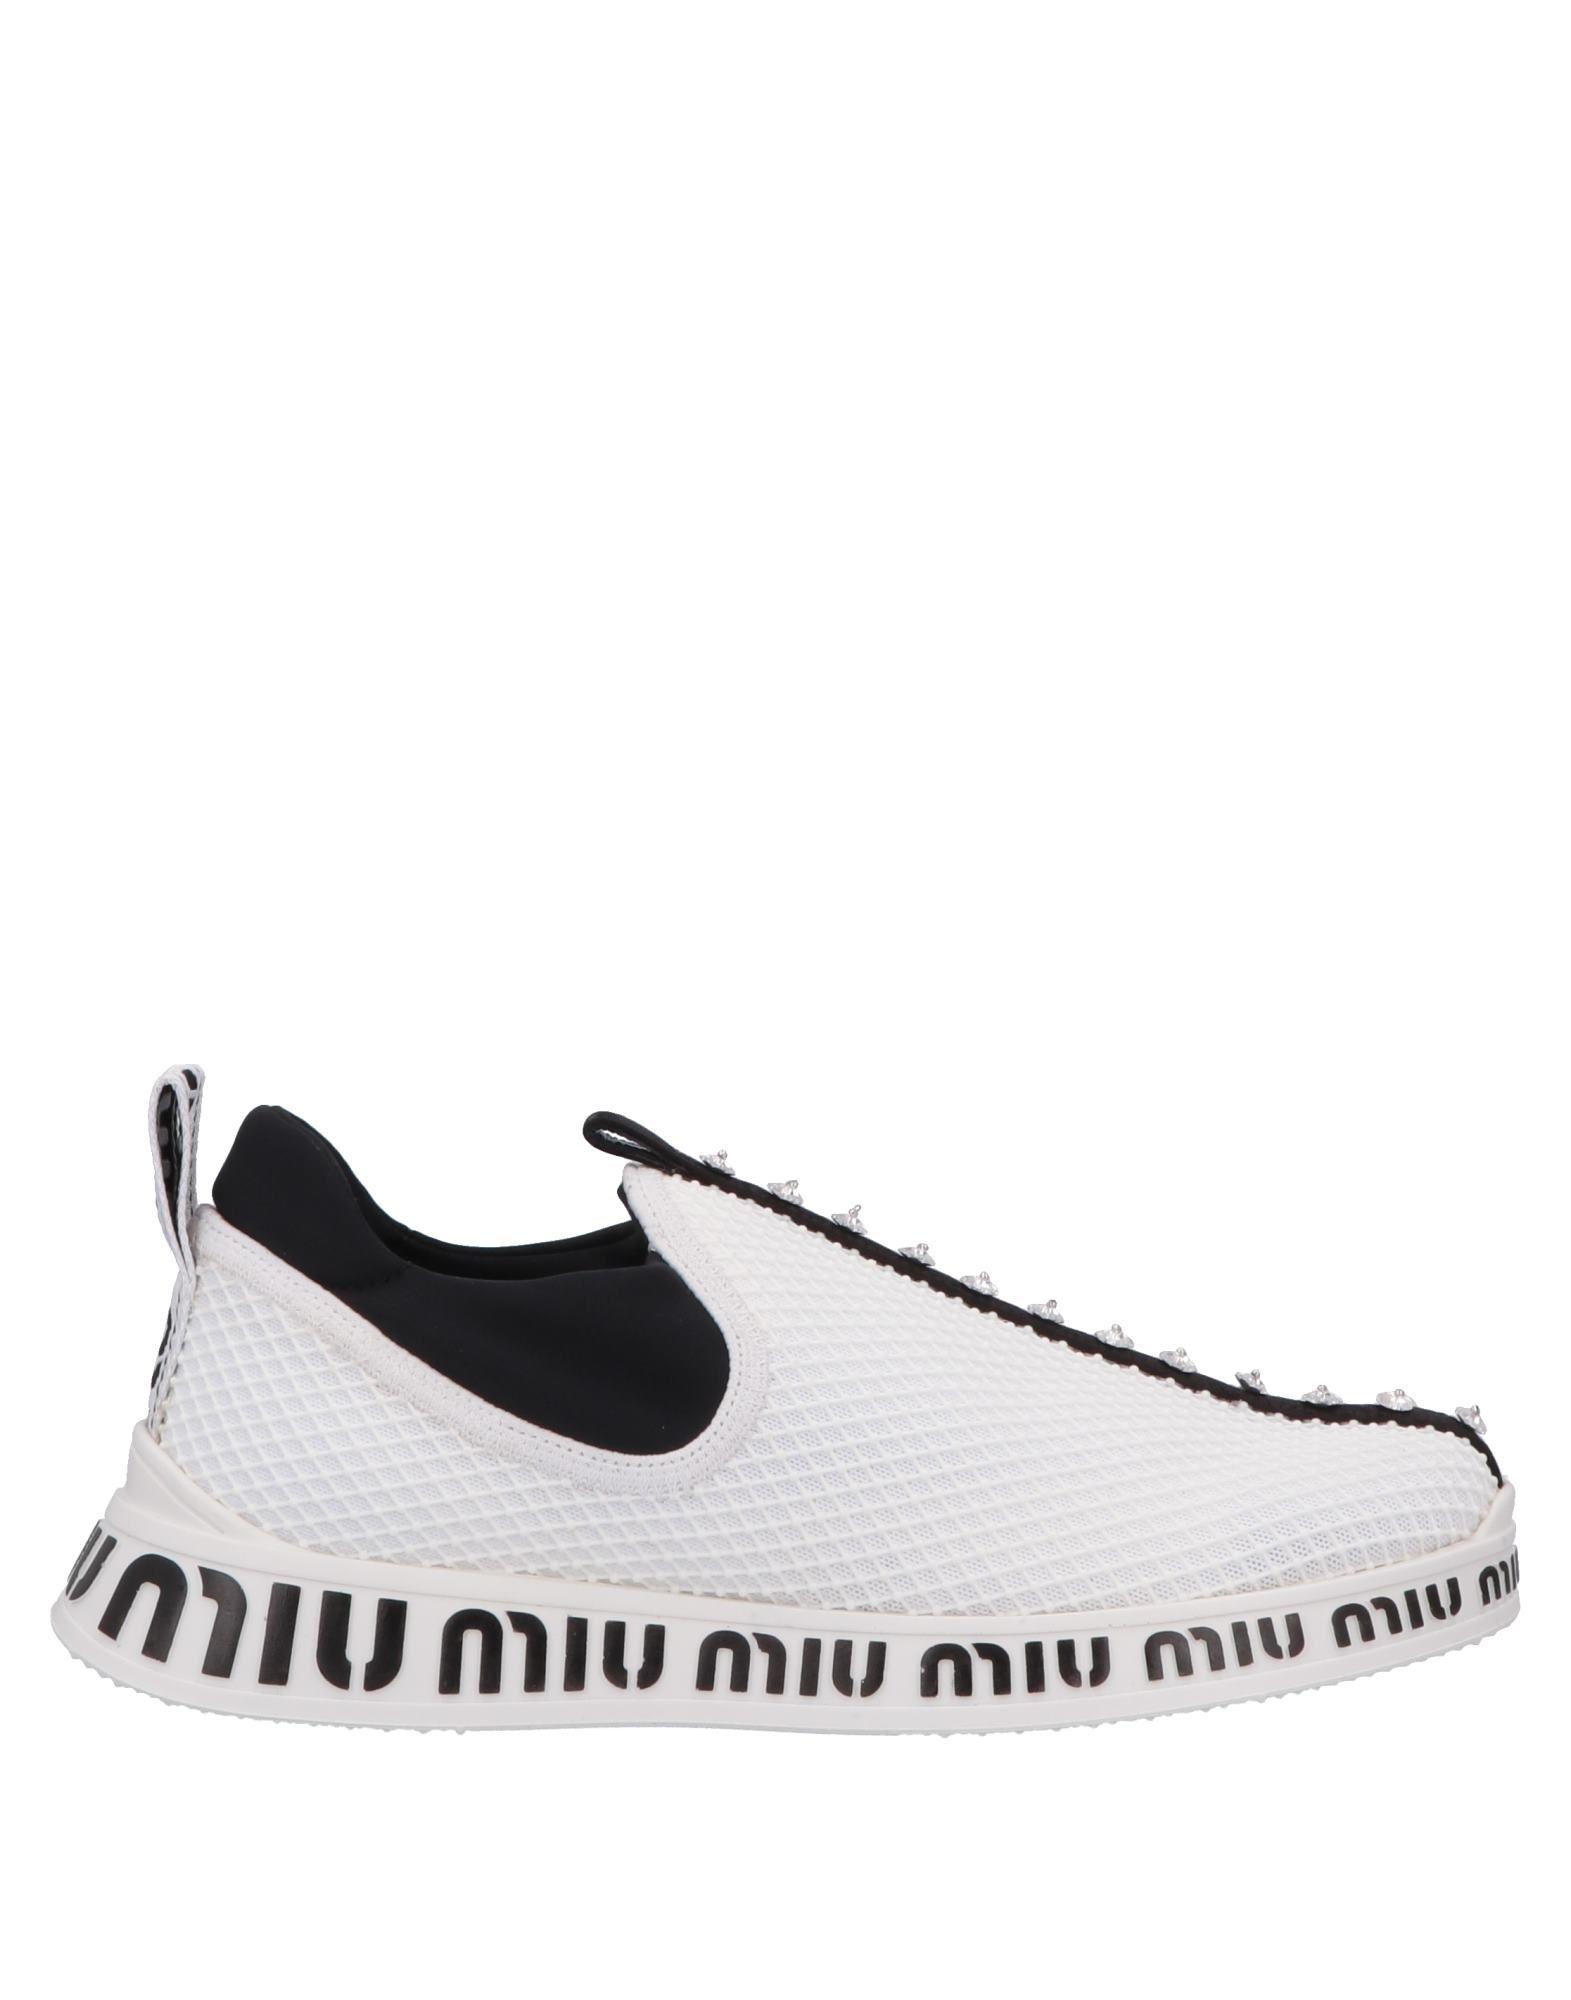 MIU MIU Низкие кеды и кроссовки